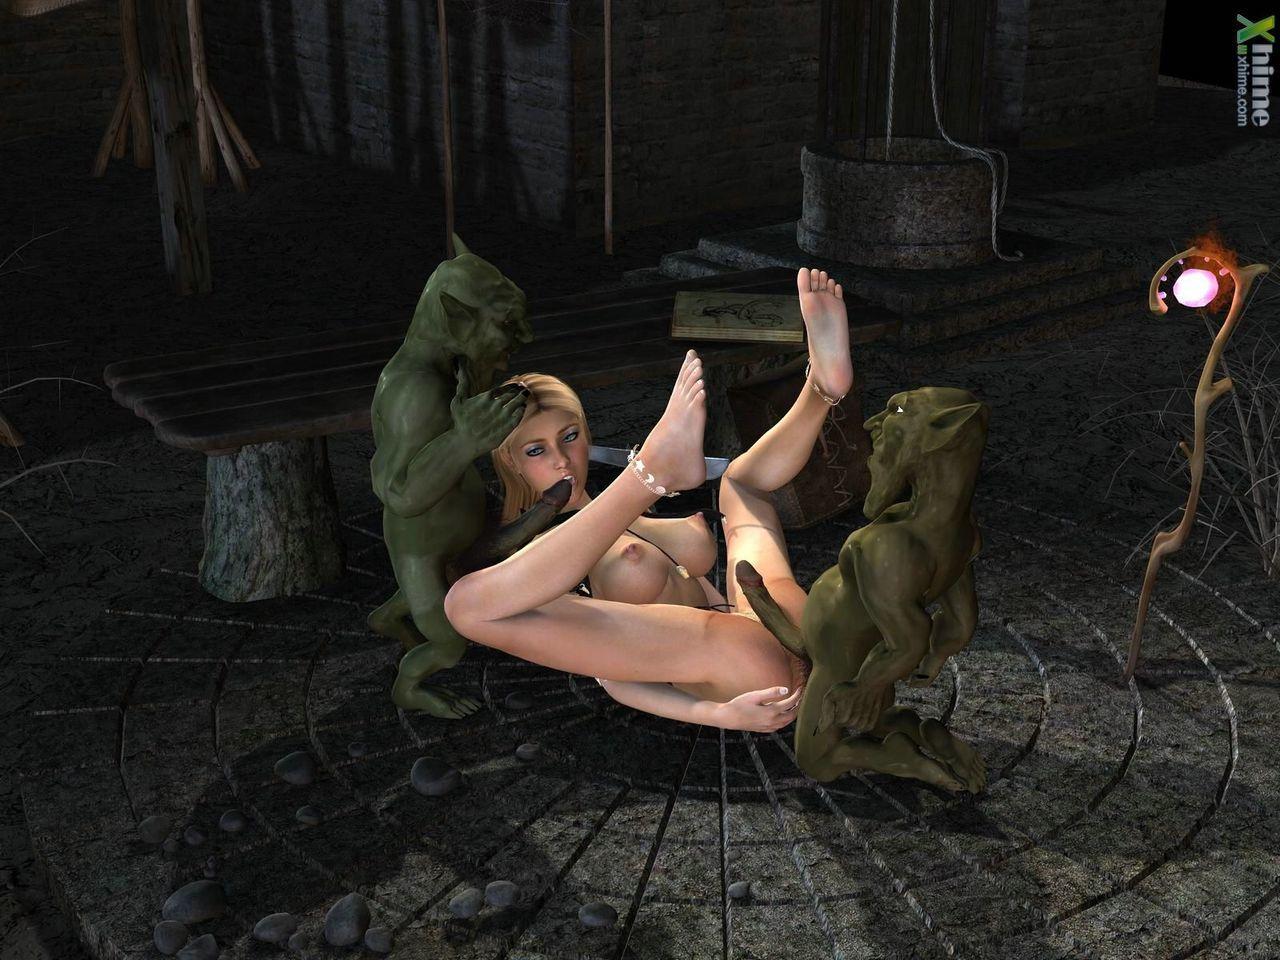 fantasy cg collection - part 3